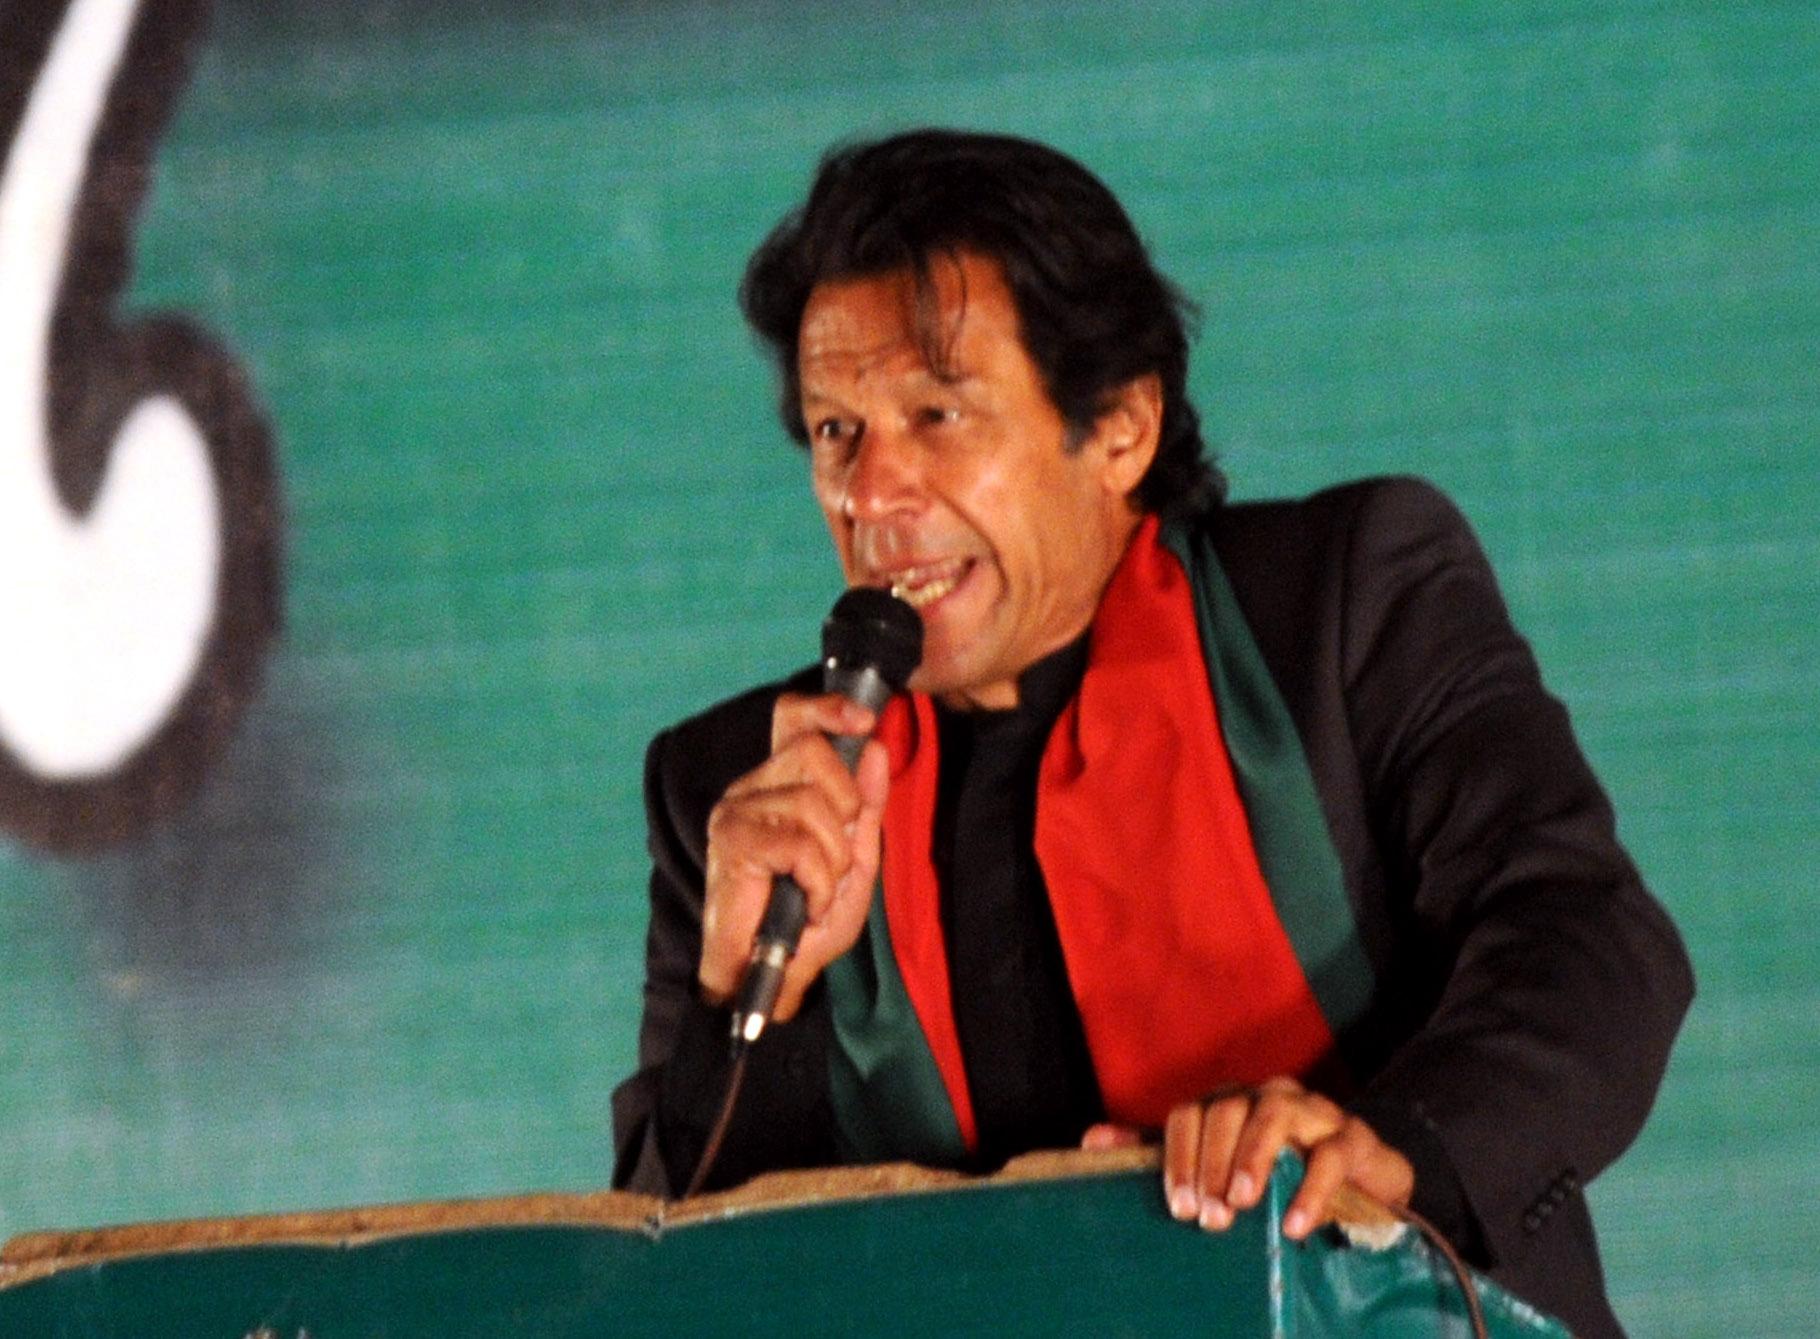 Pakistan condoles Vajpayee's death, Imran Khan says void in South Asian politics